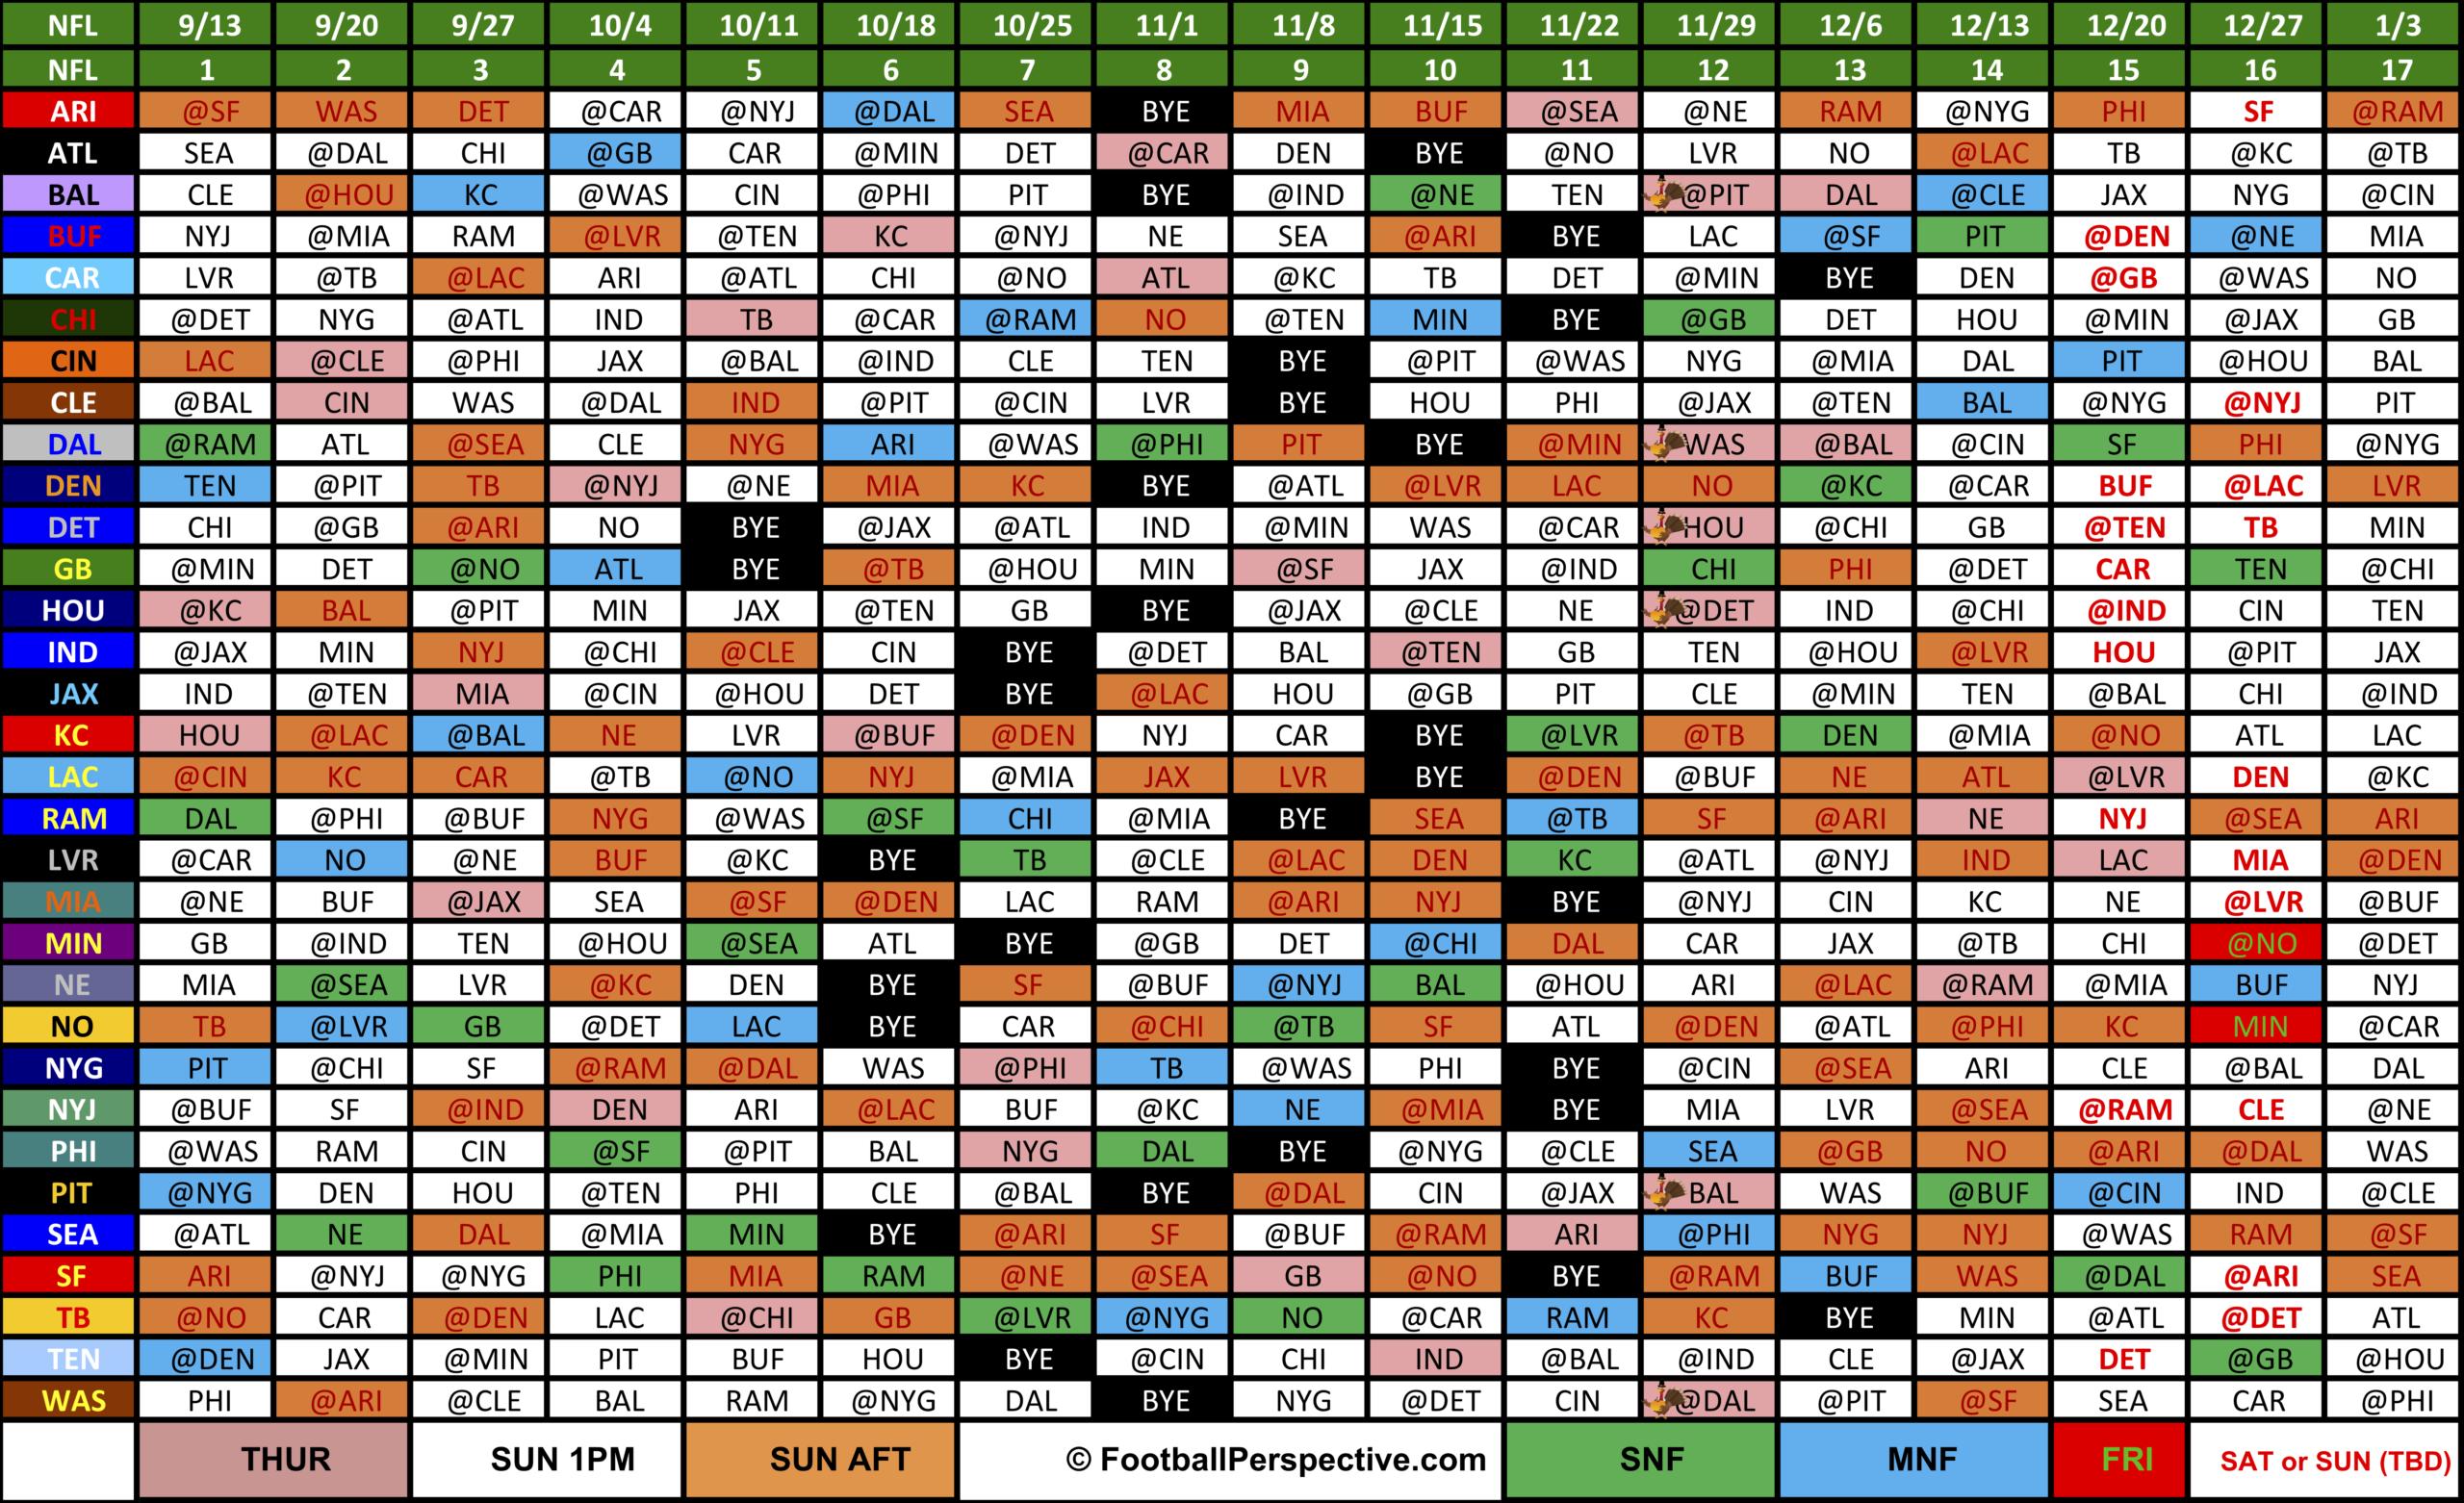 The 2020 Nfl Schedule in Printable Nfl Schedule 2021 Season